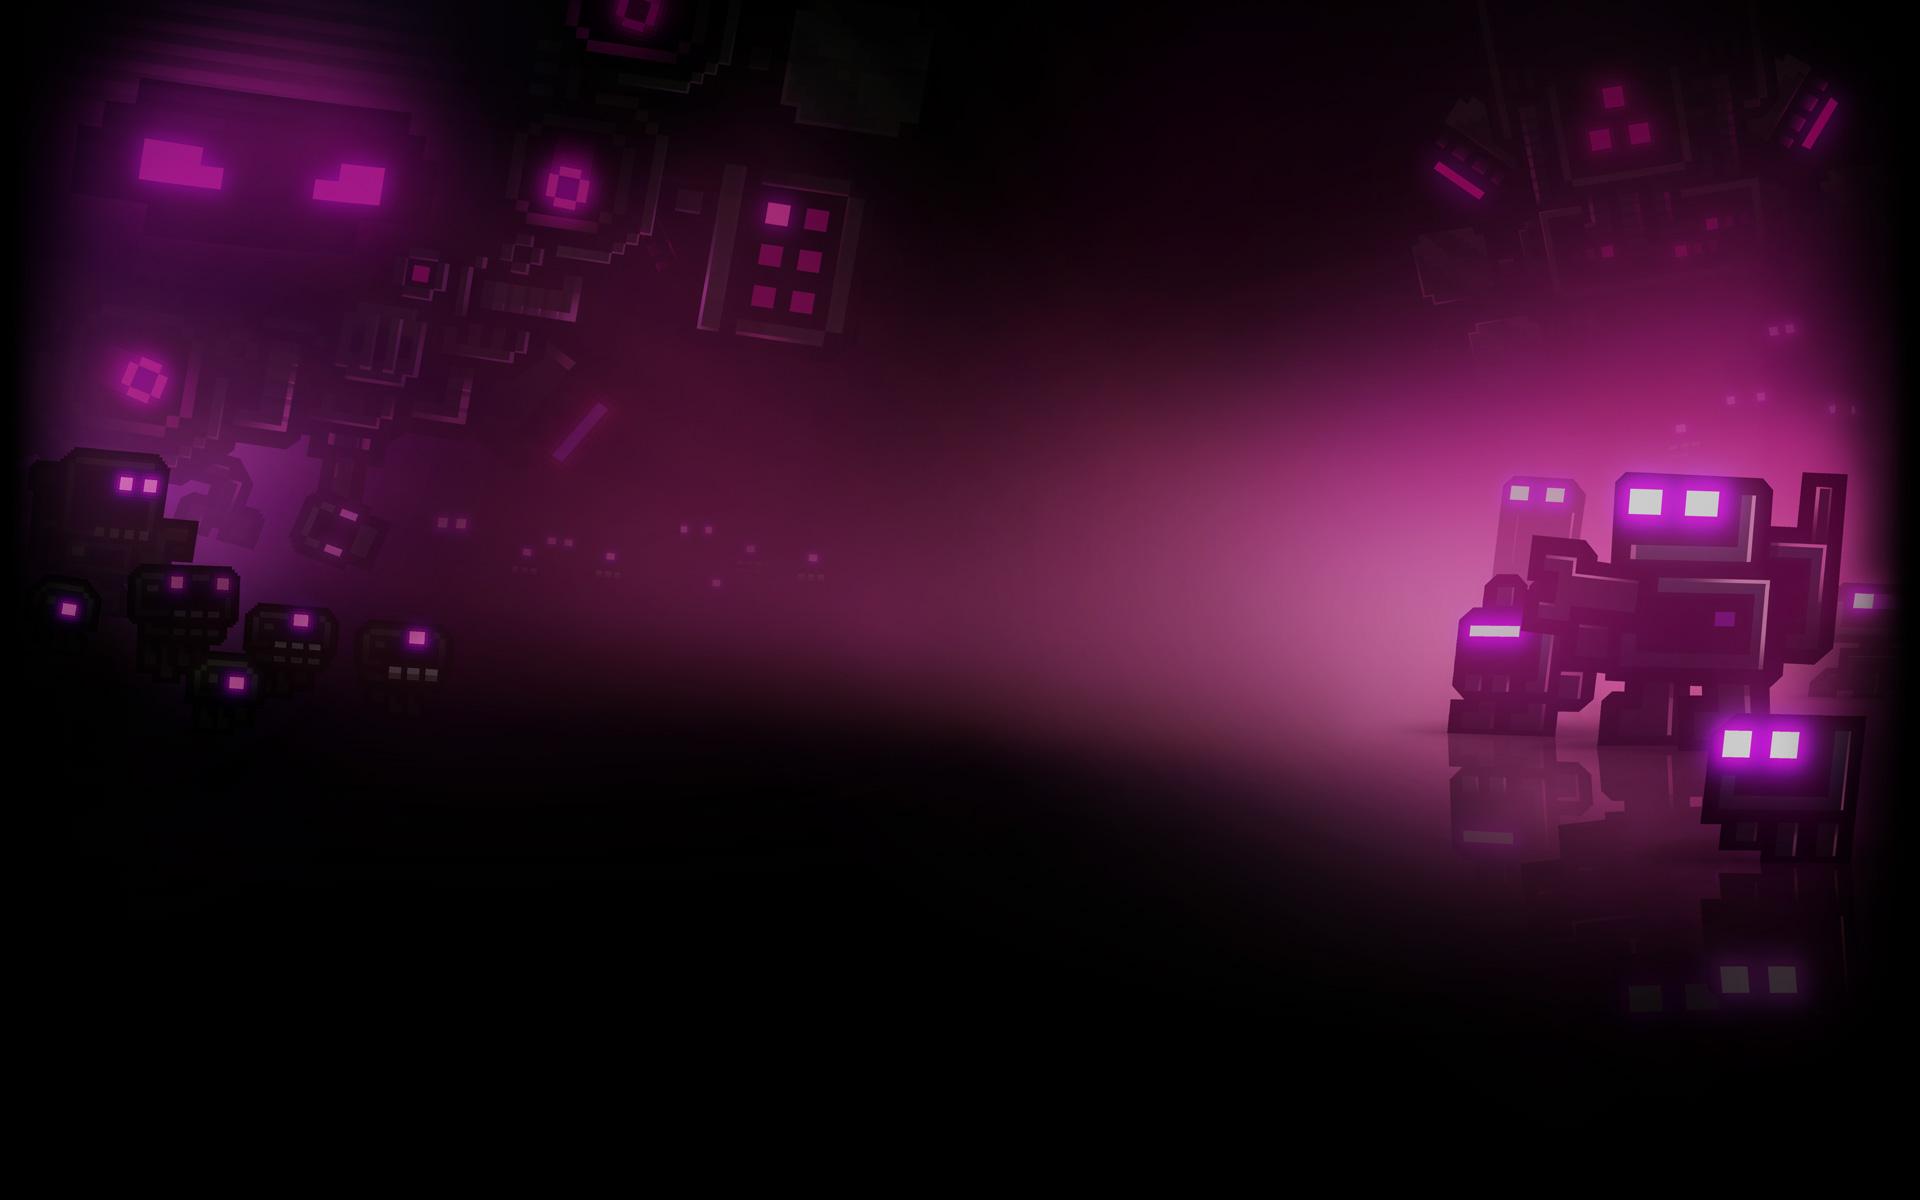 Cute pinkish backgrounds 3 Steam munity